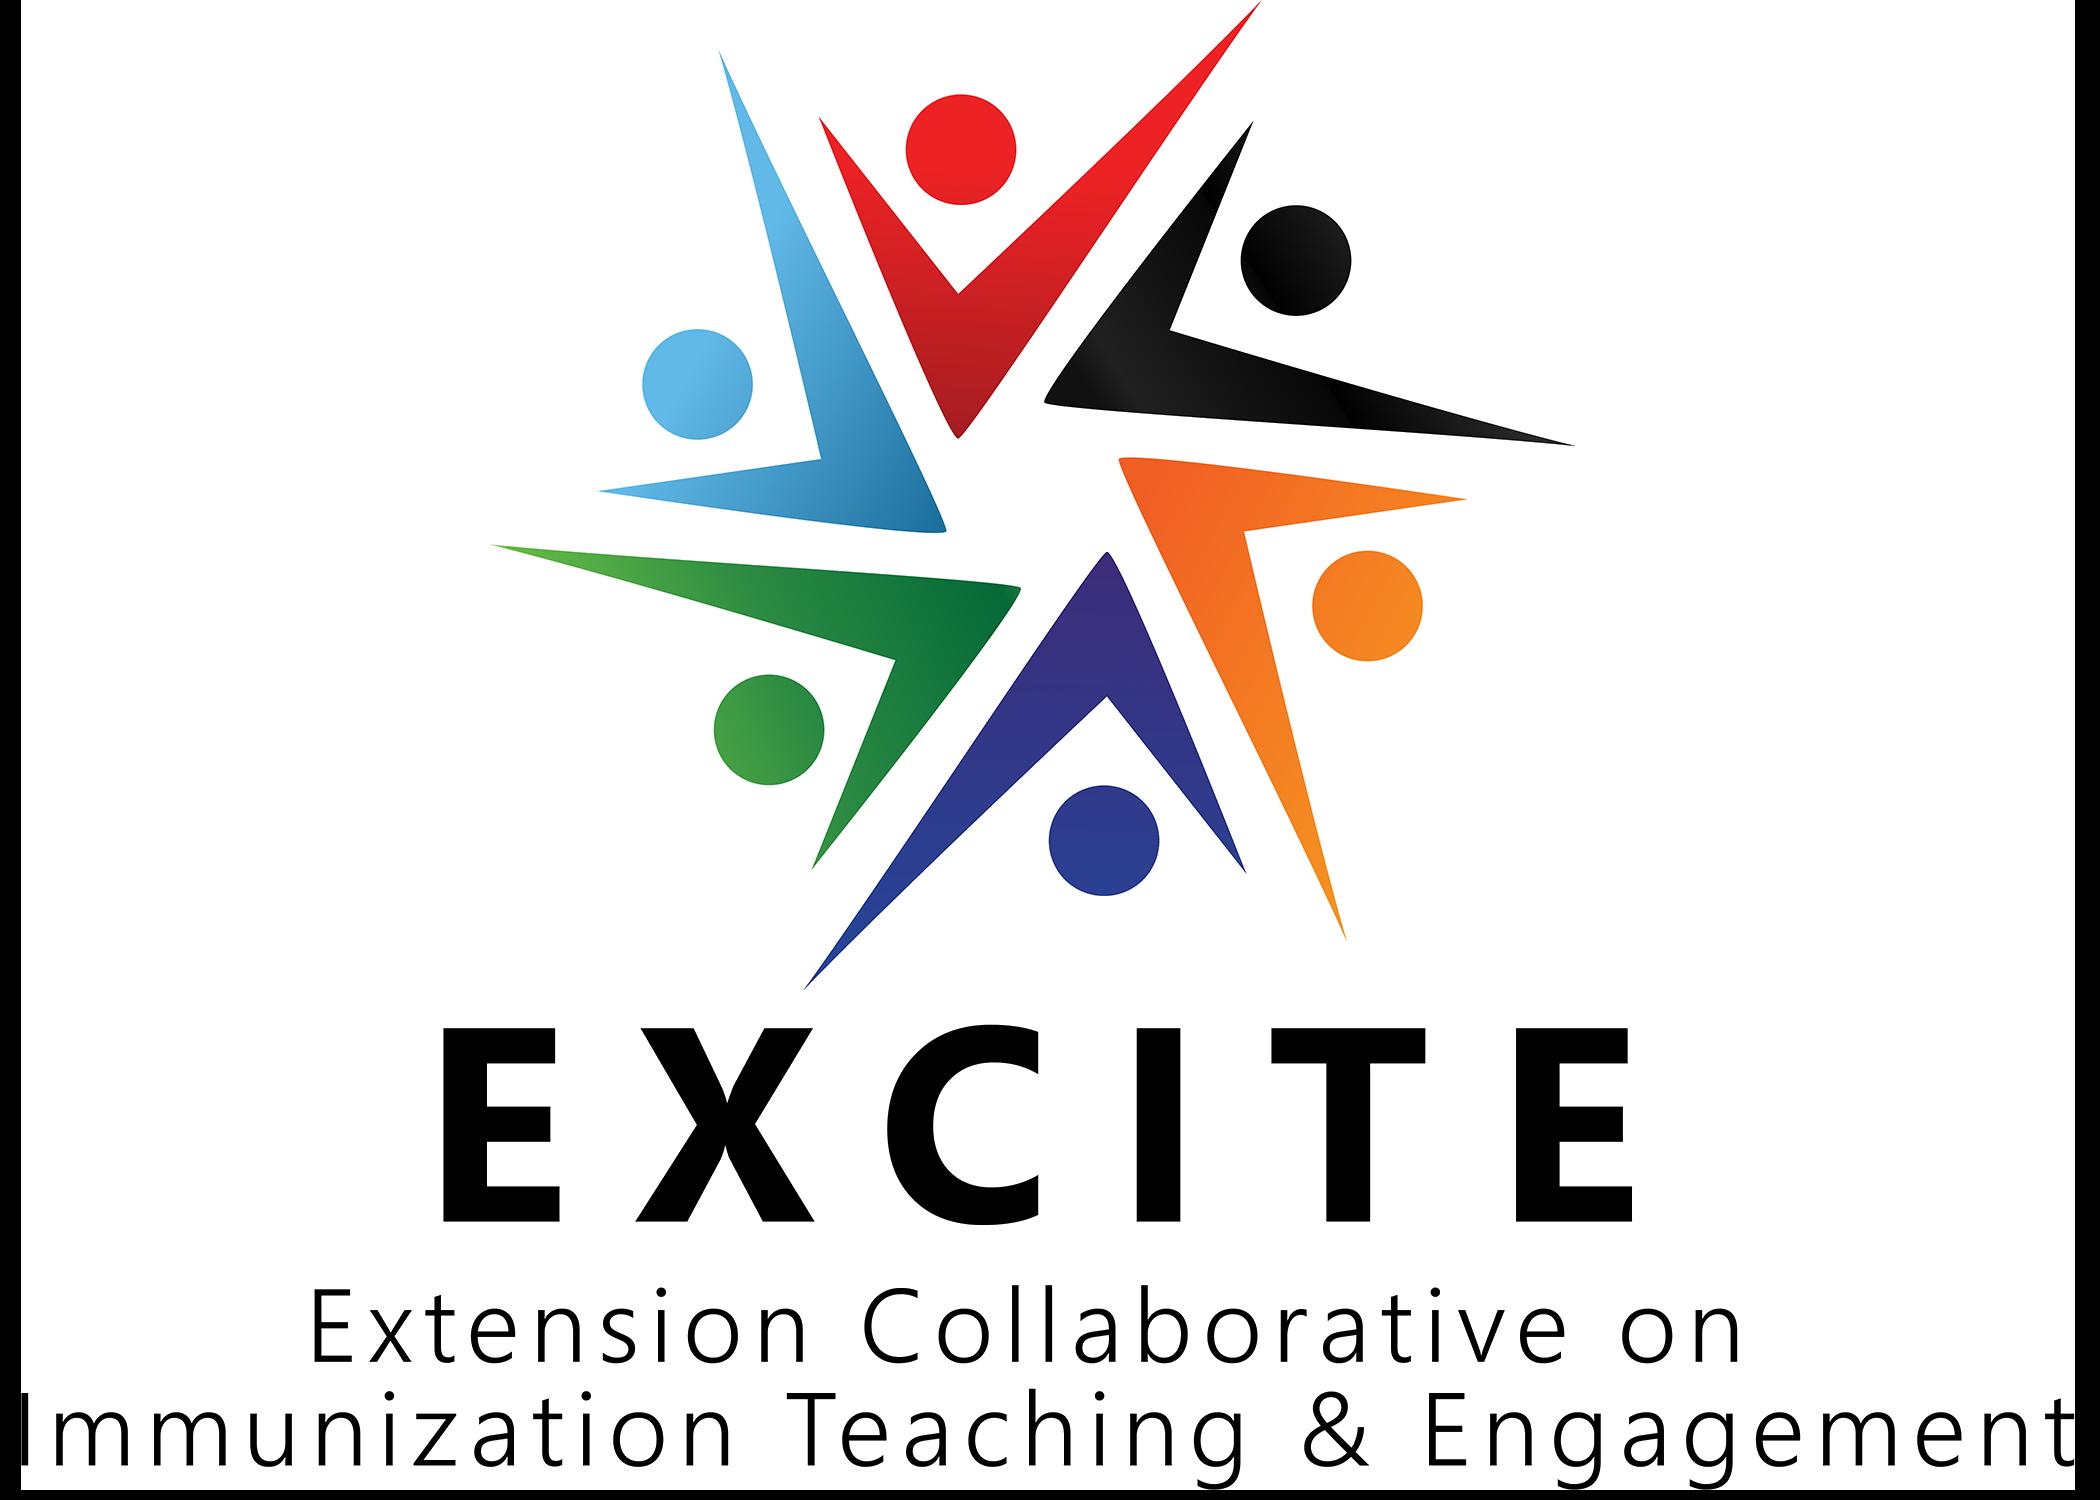 EXCITE Portal